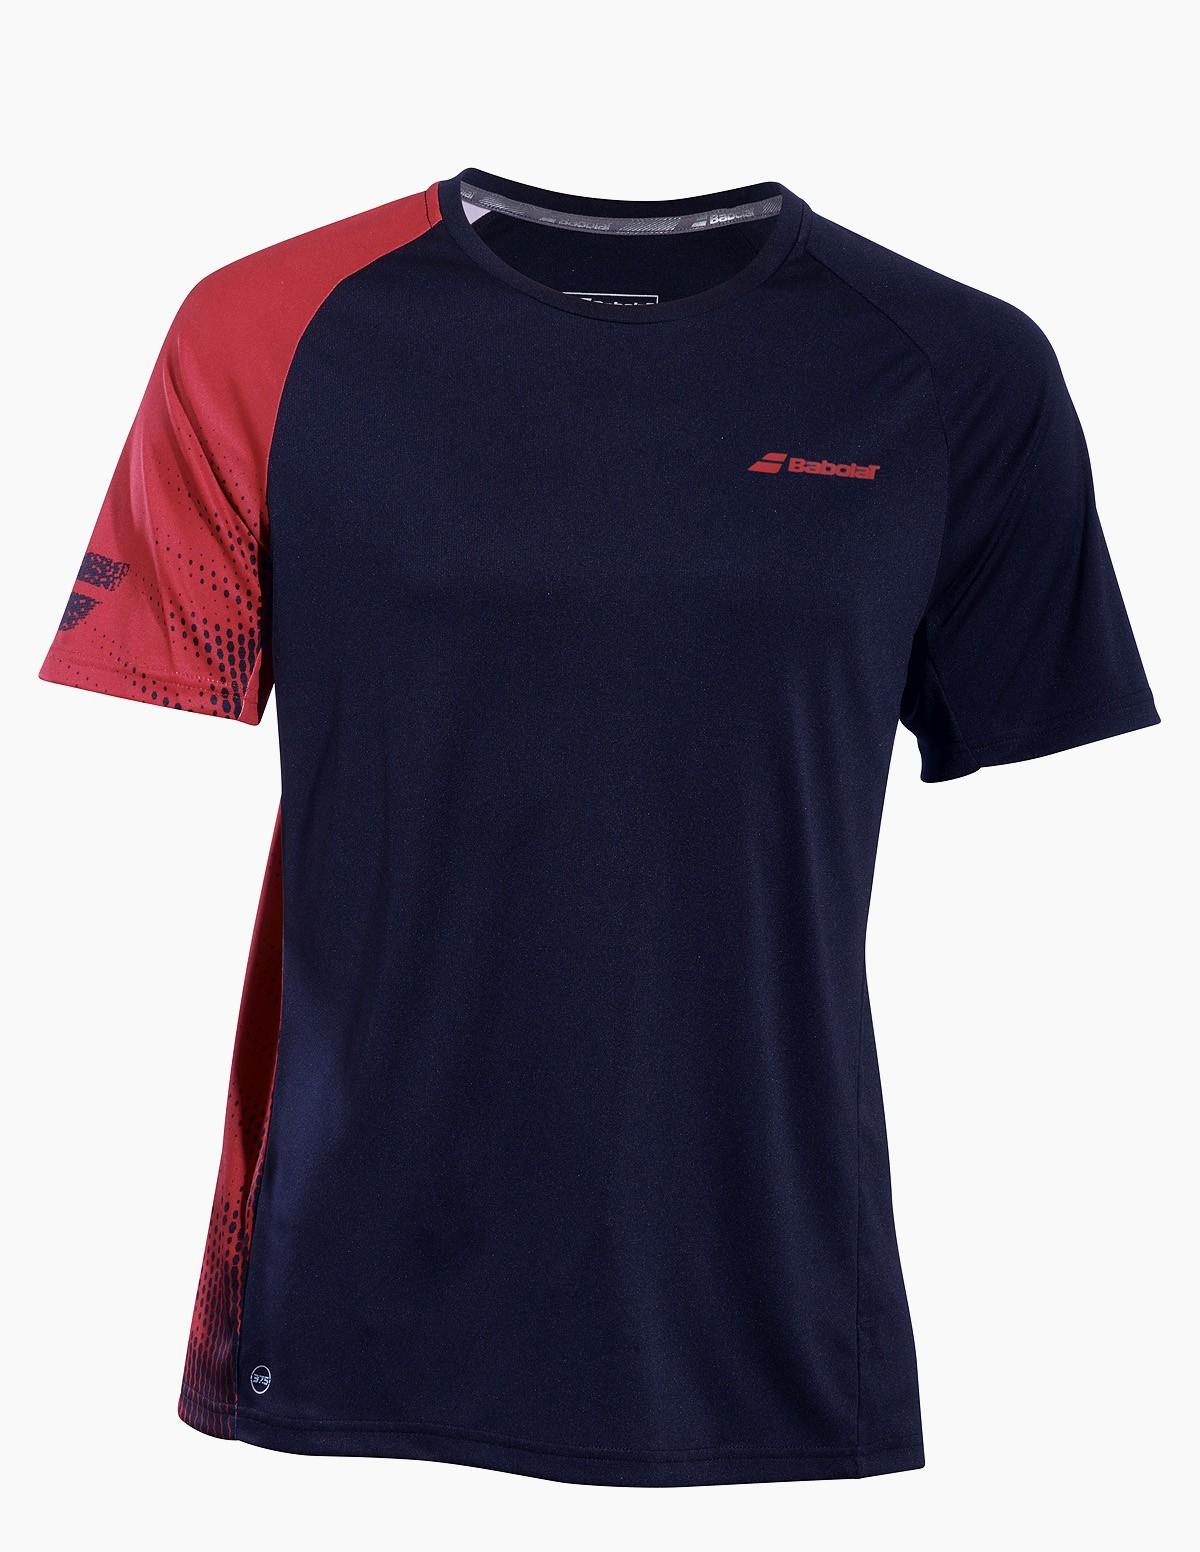 Koszulka tenisowa chłopięca Babolat PERF T-shirt Black -45%